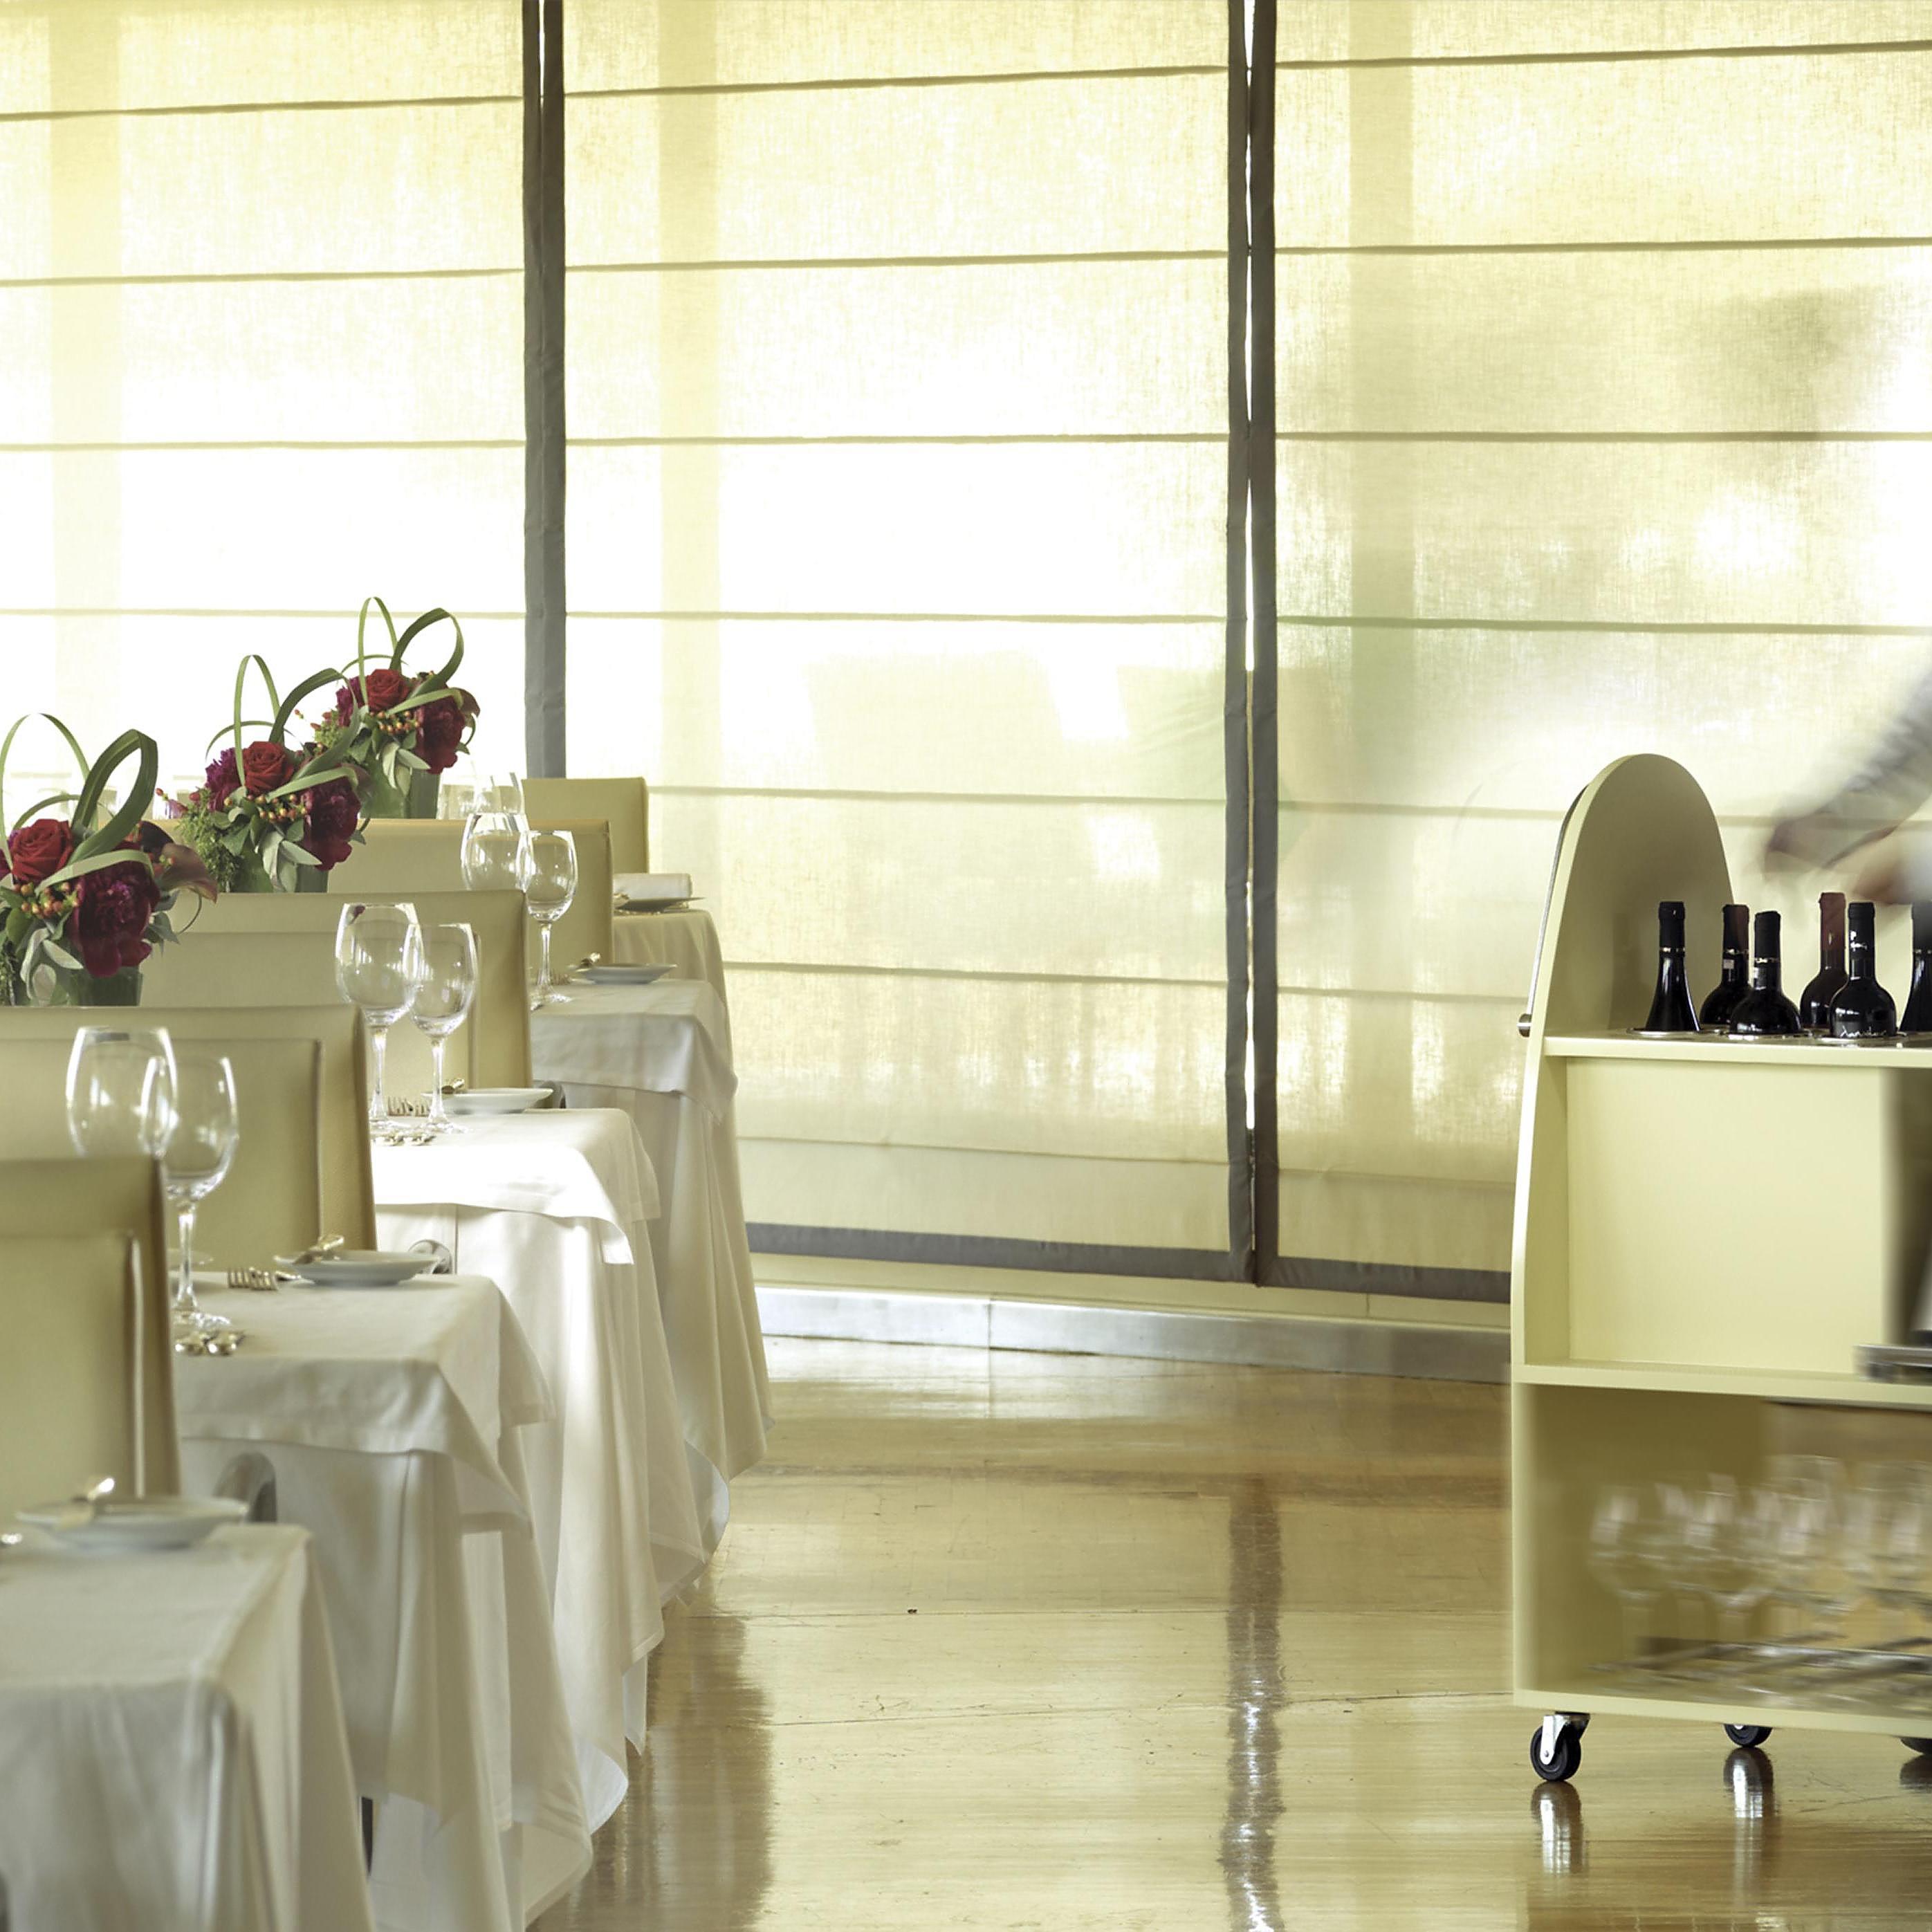 Luxury 5-Star Hotel: InterContinental Athenaeum Athens